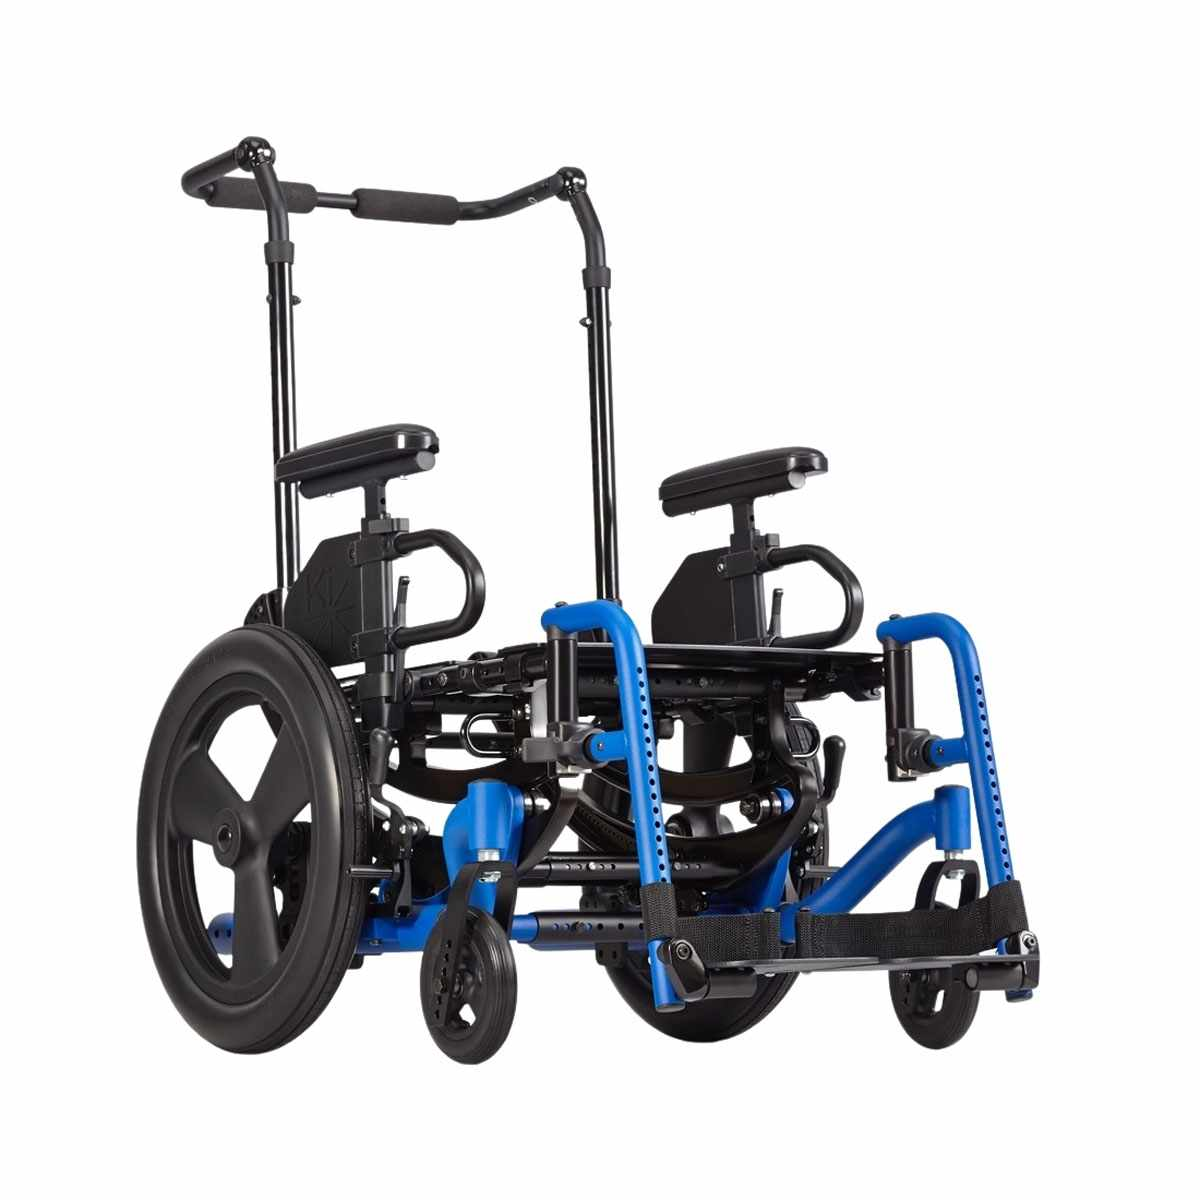 Ki Mobility Focus CR tilt wheelchair